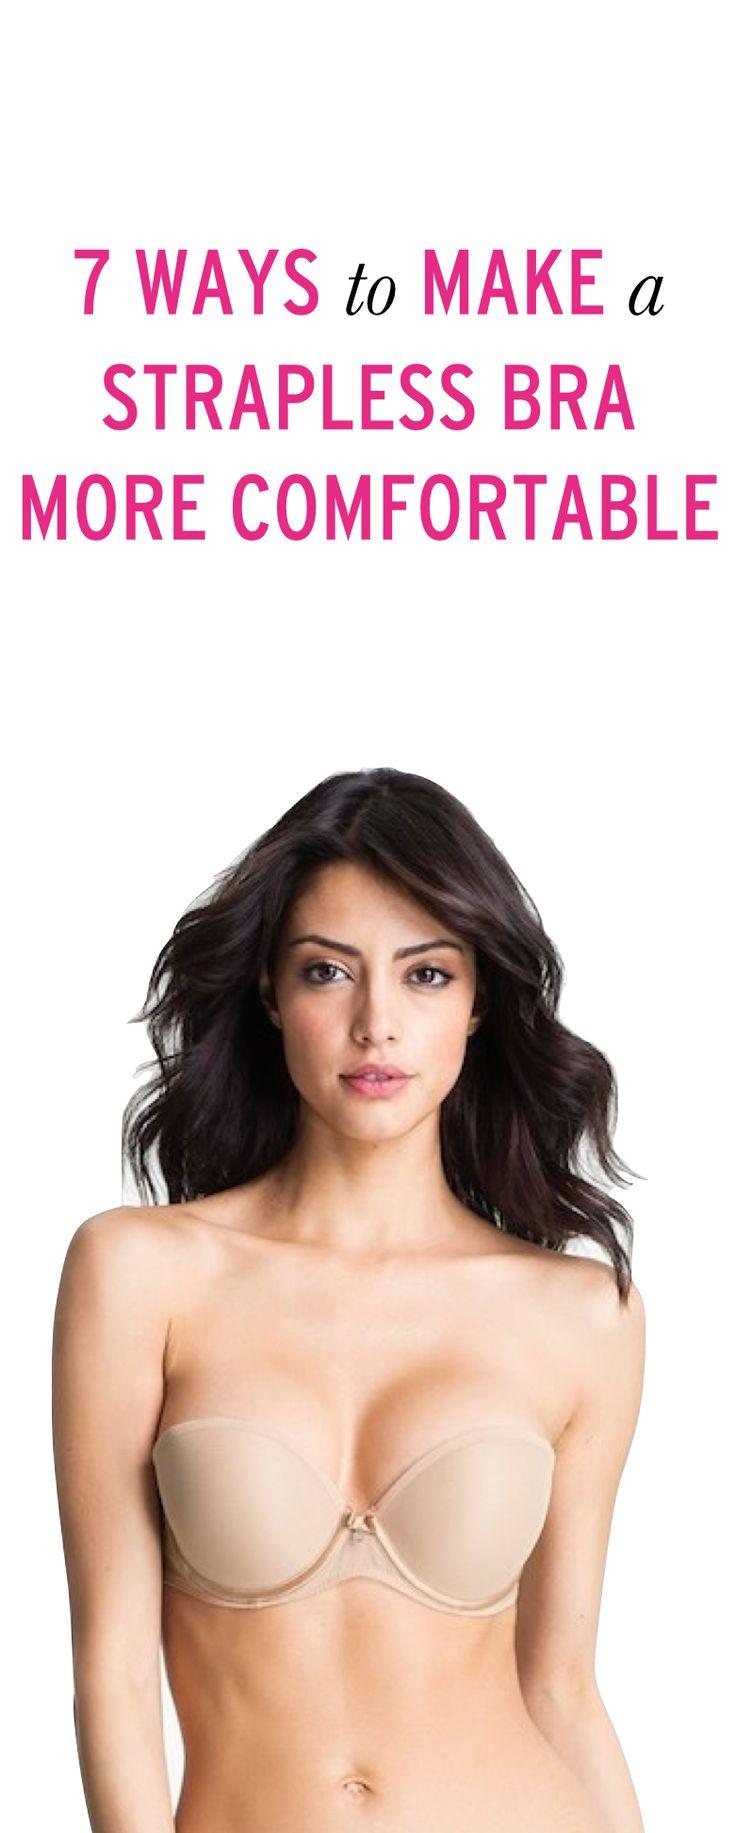 7 ways to make a strapless bra less annoying #ambassador